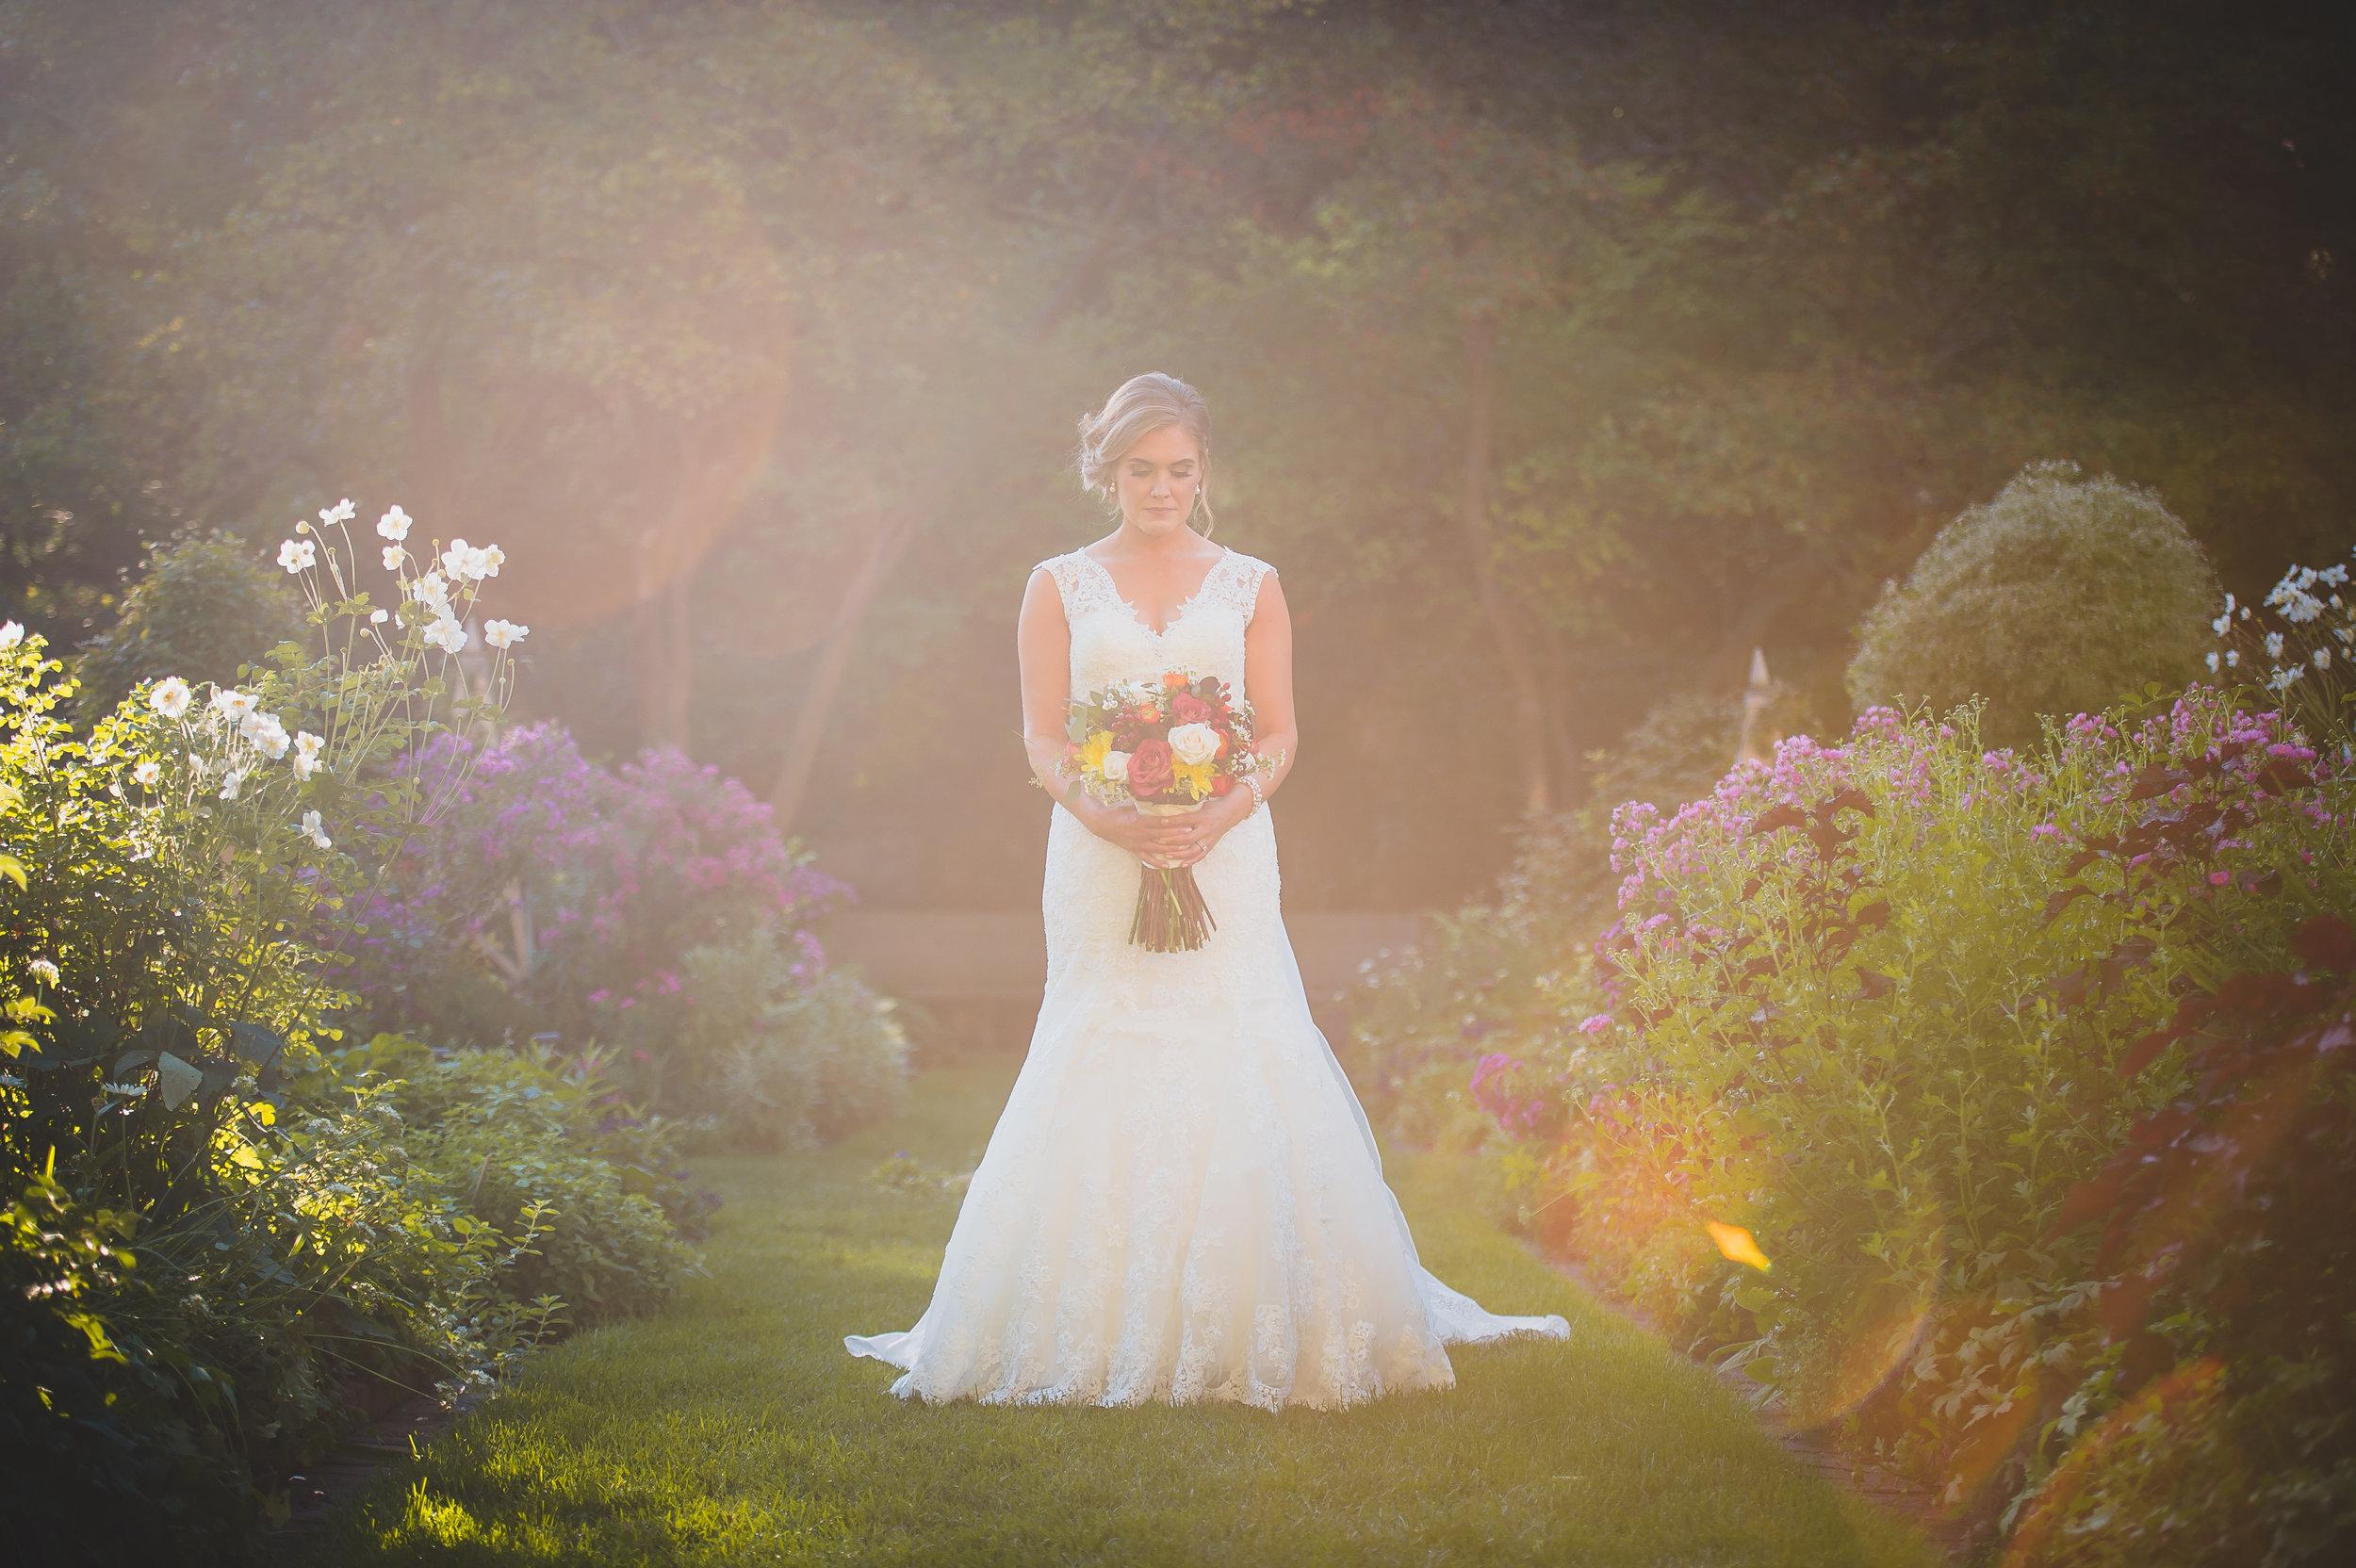 madison phil wedding_GXM_6963.jpg